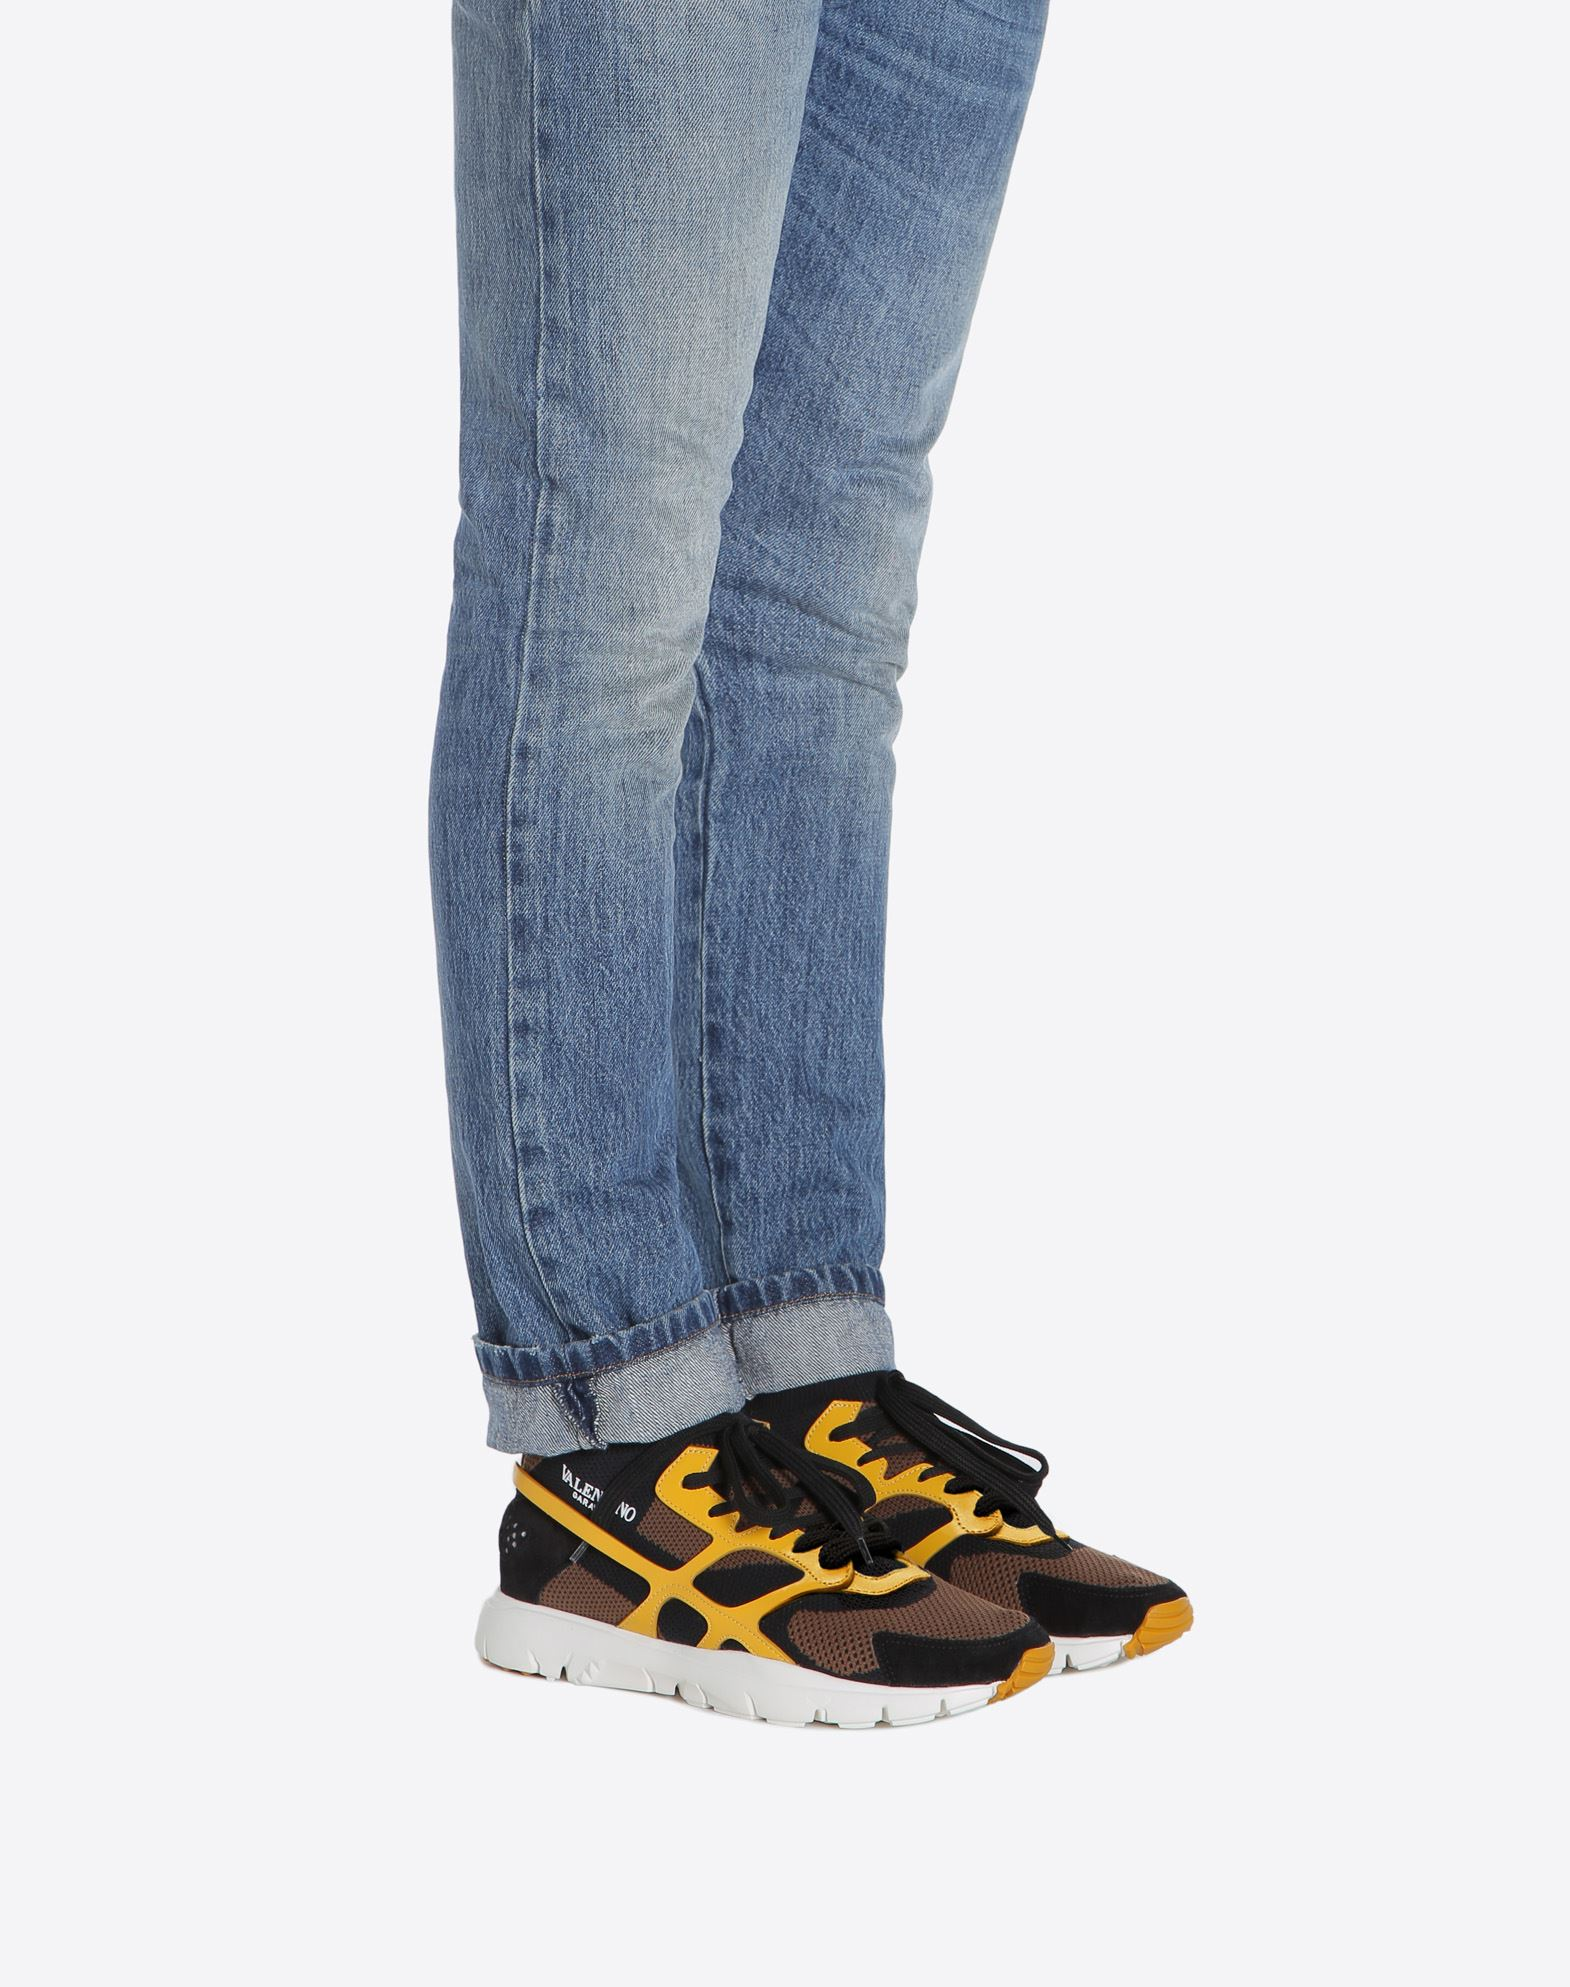 VALENTINO GARAVANI UOMO Sneakers Sound High SNEAKERS ALTAS U a